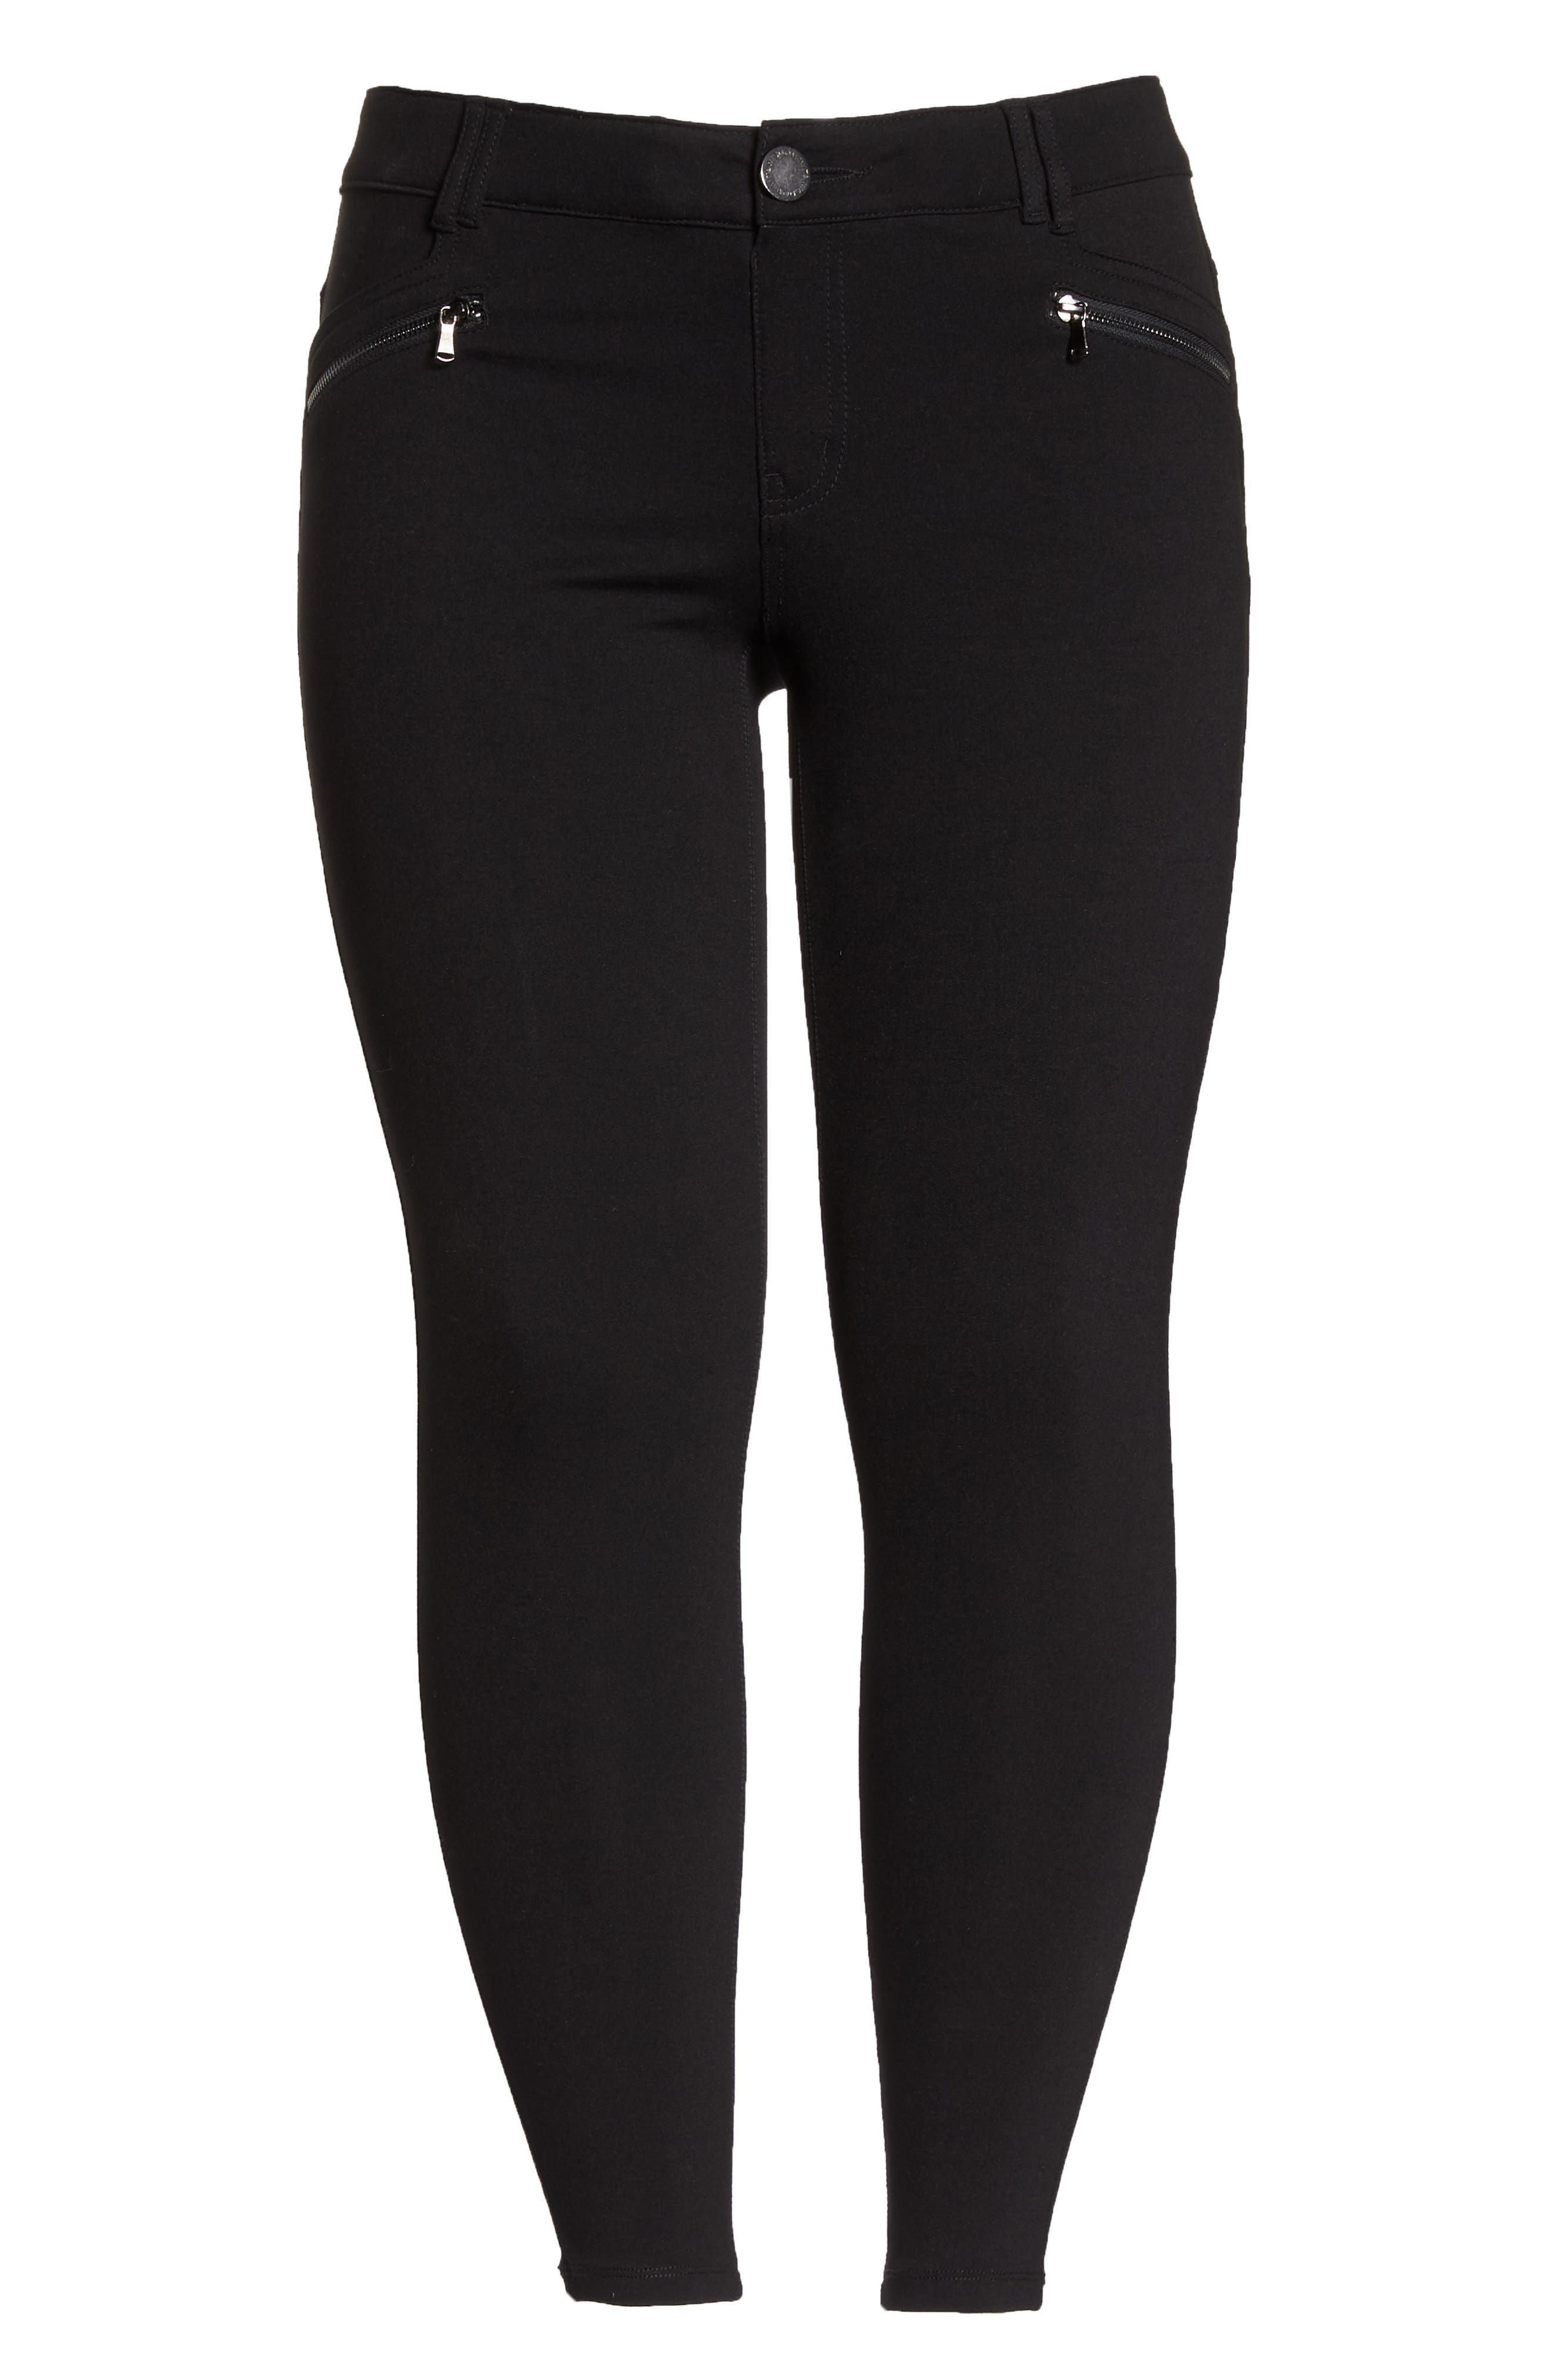 Ab-solution Zip Pocket Skinny Pants,                             Alternate thumbnail 7, color,                             BLACK